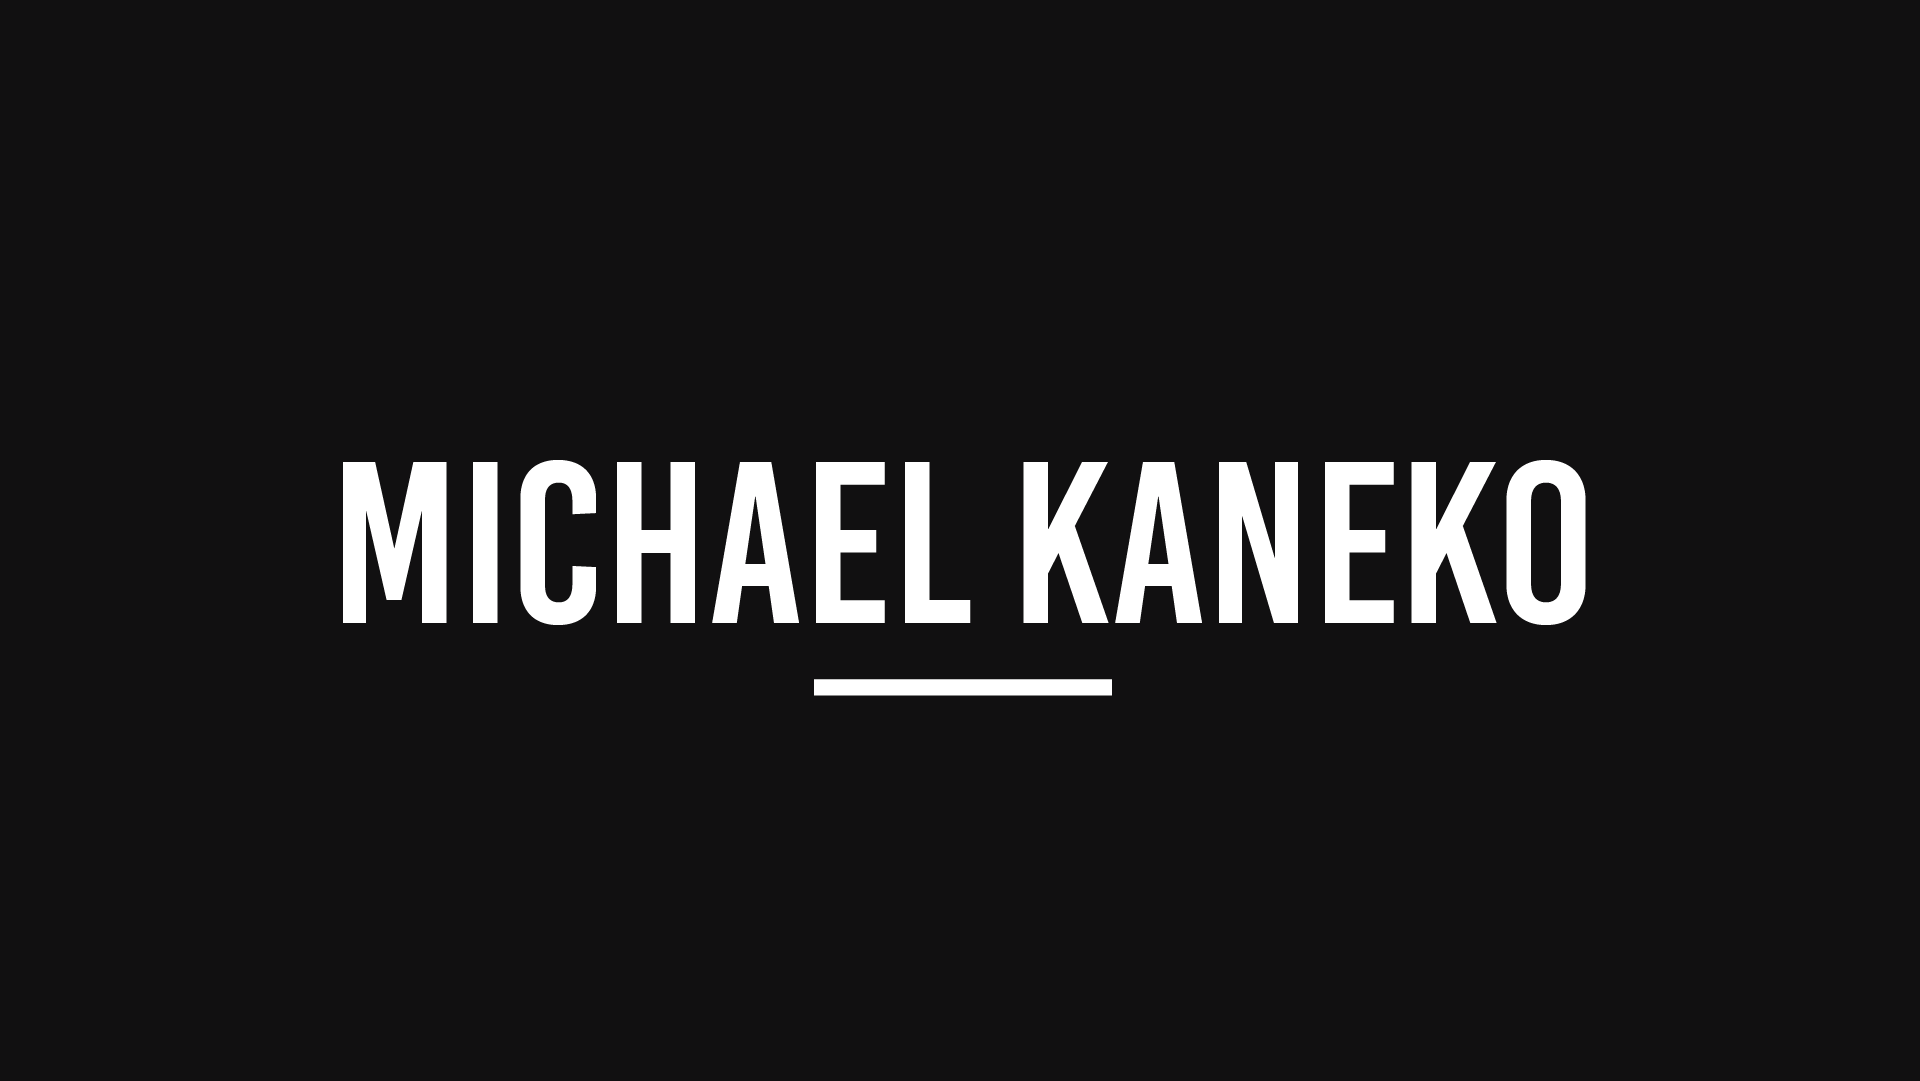 Michael Kaneko